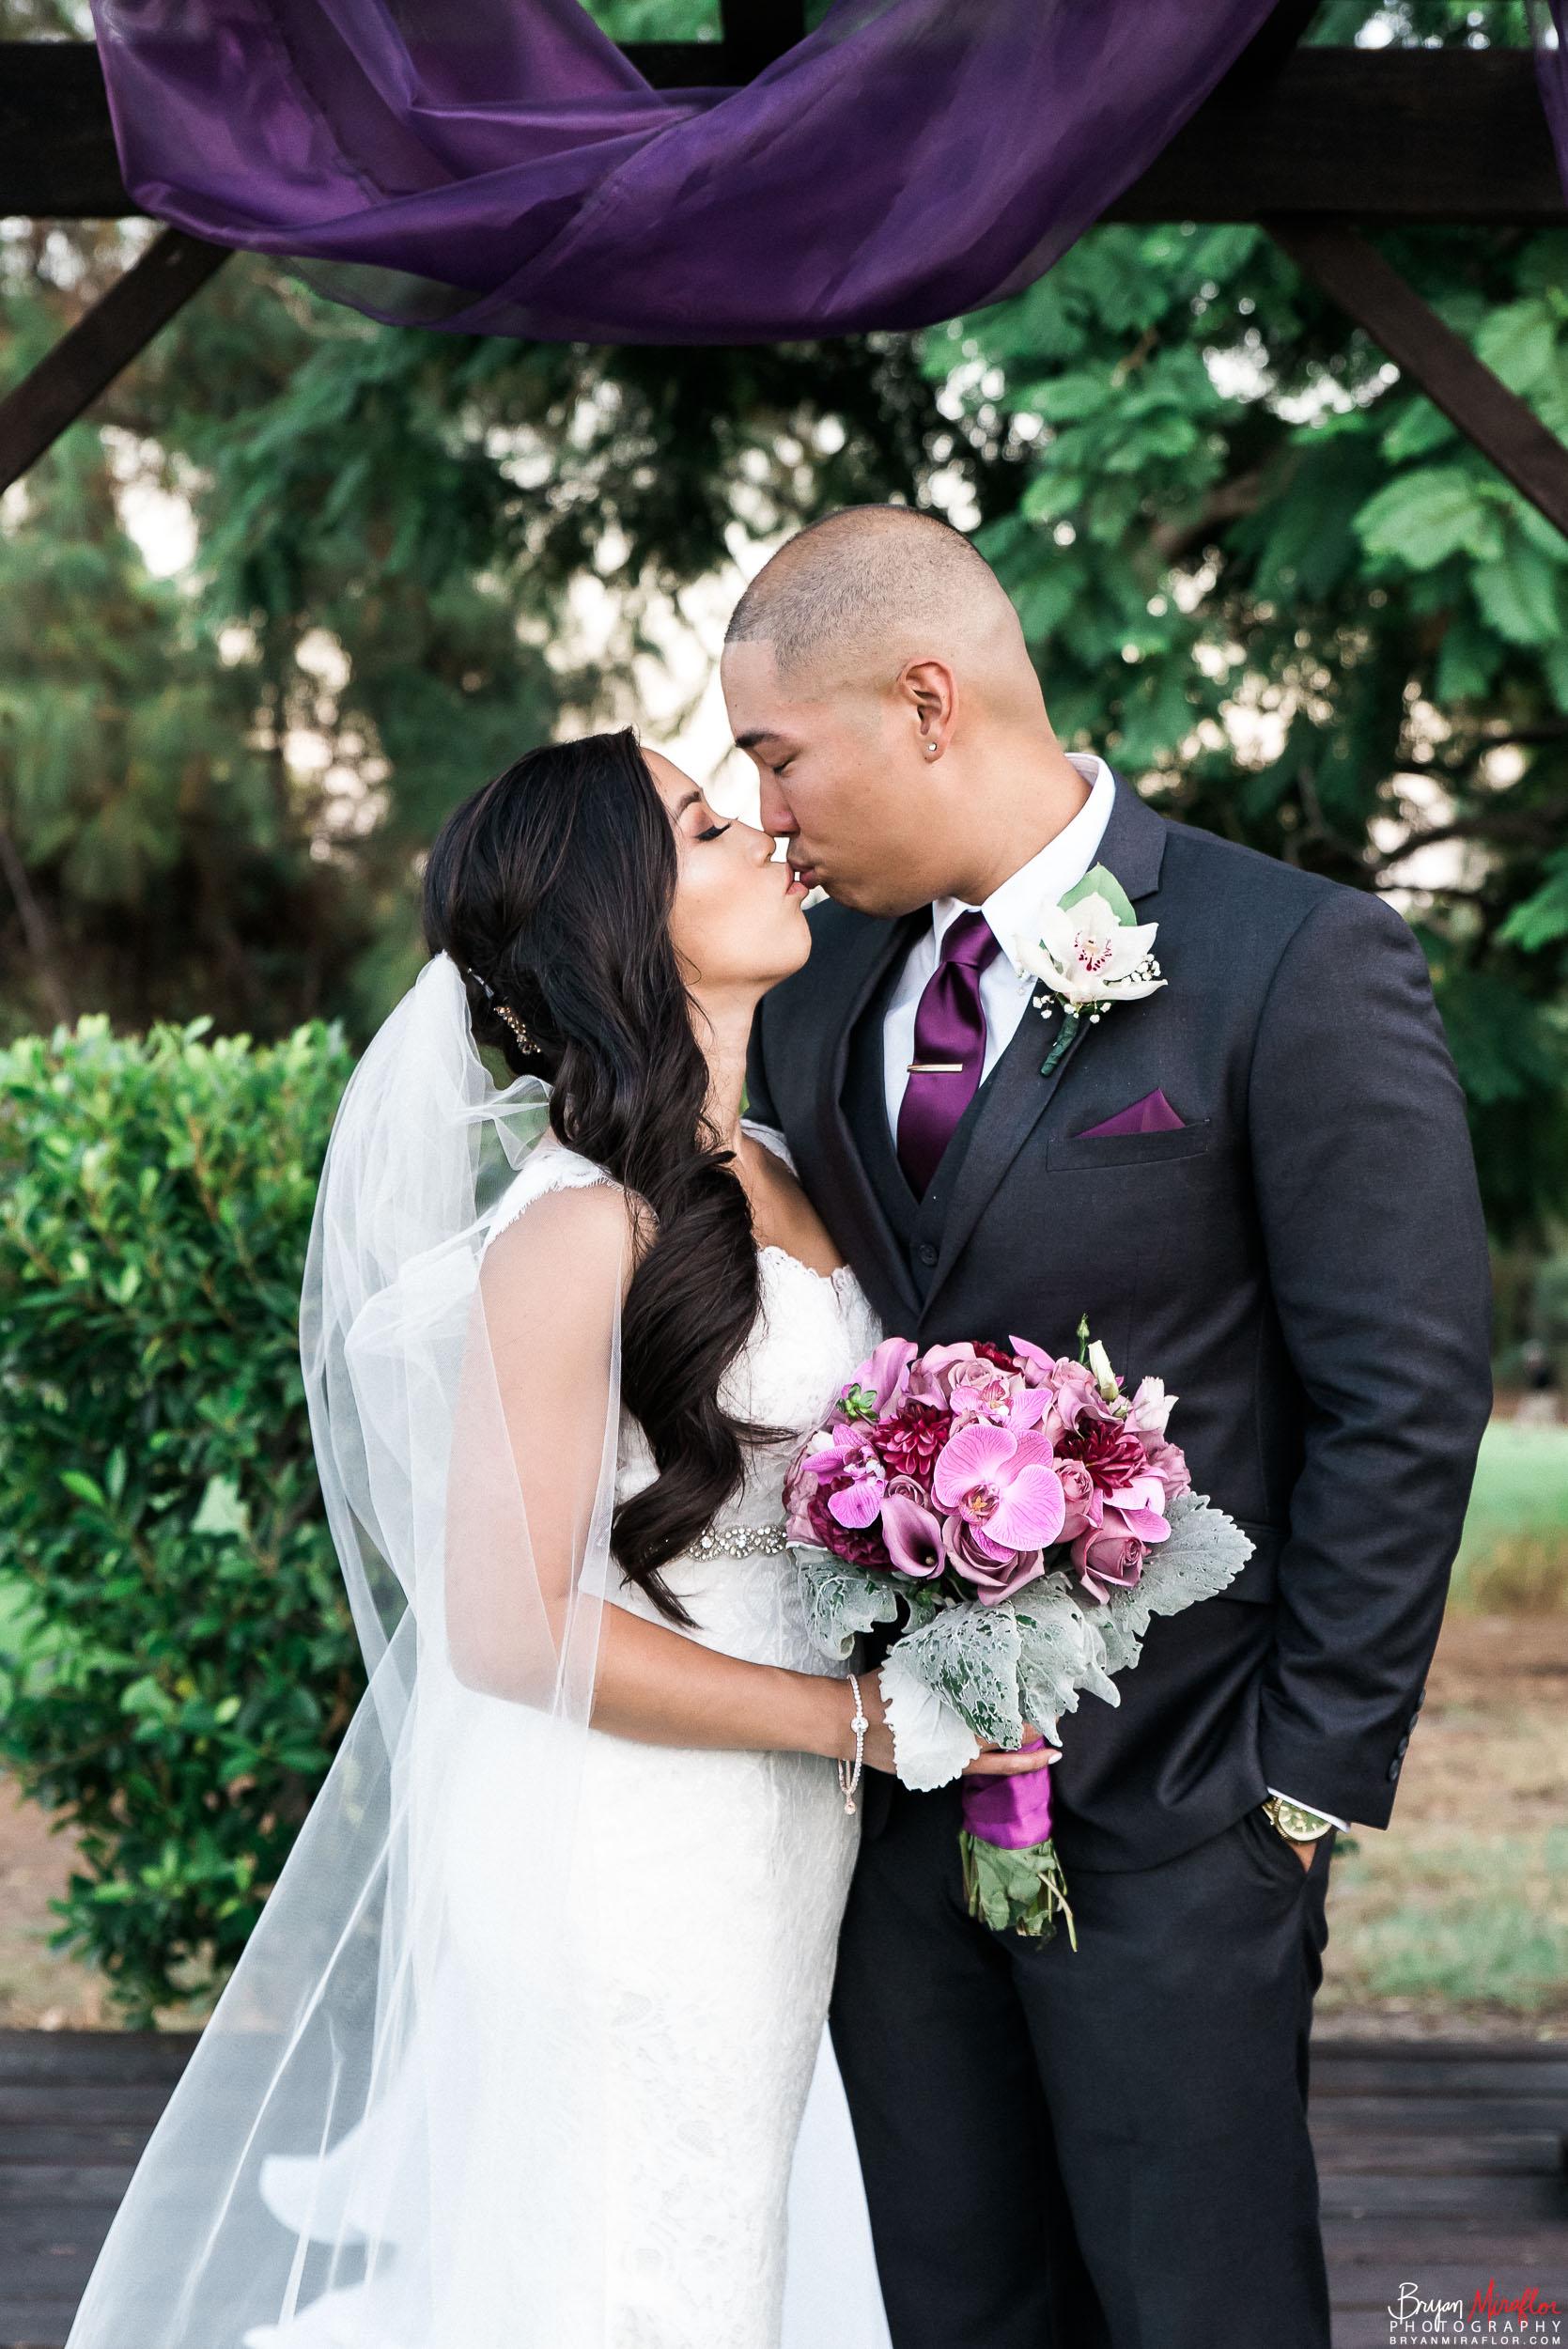 Bryan-Miraflor-Photography-Trisha-Dexter-Married-20170923-060.jpg